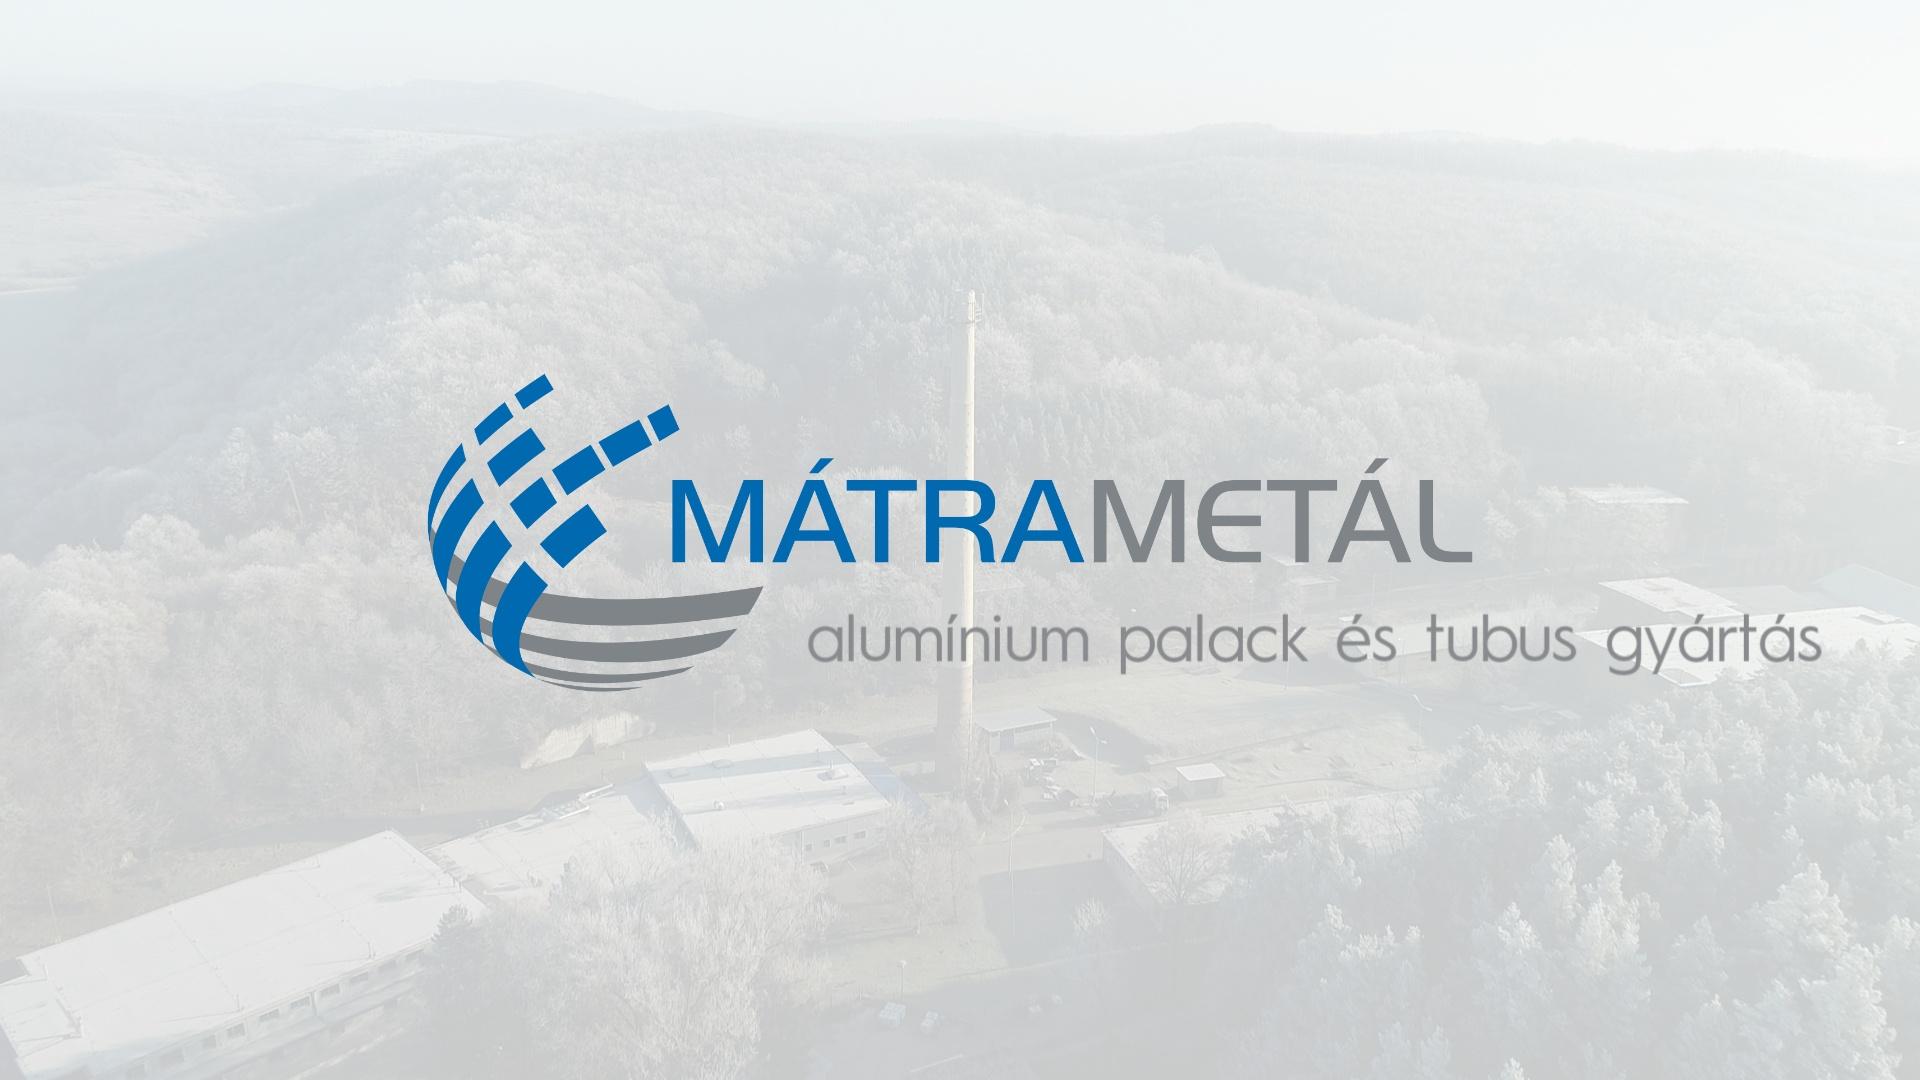 Mátrametál // image film